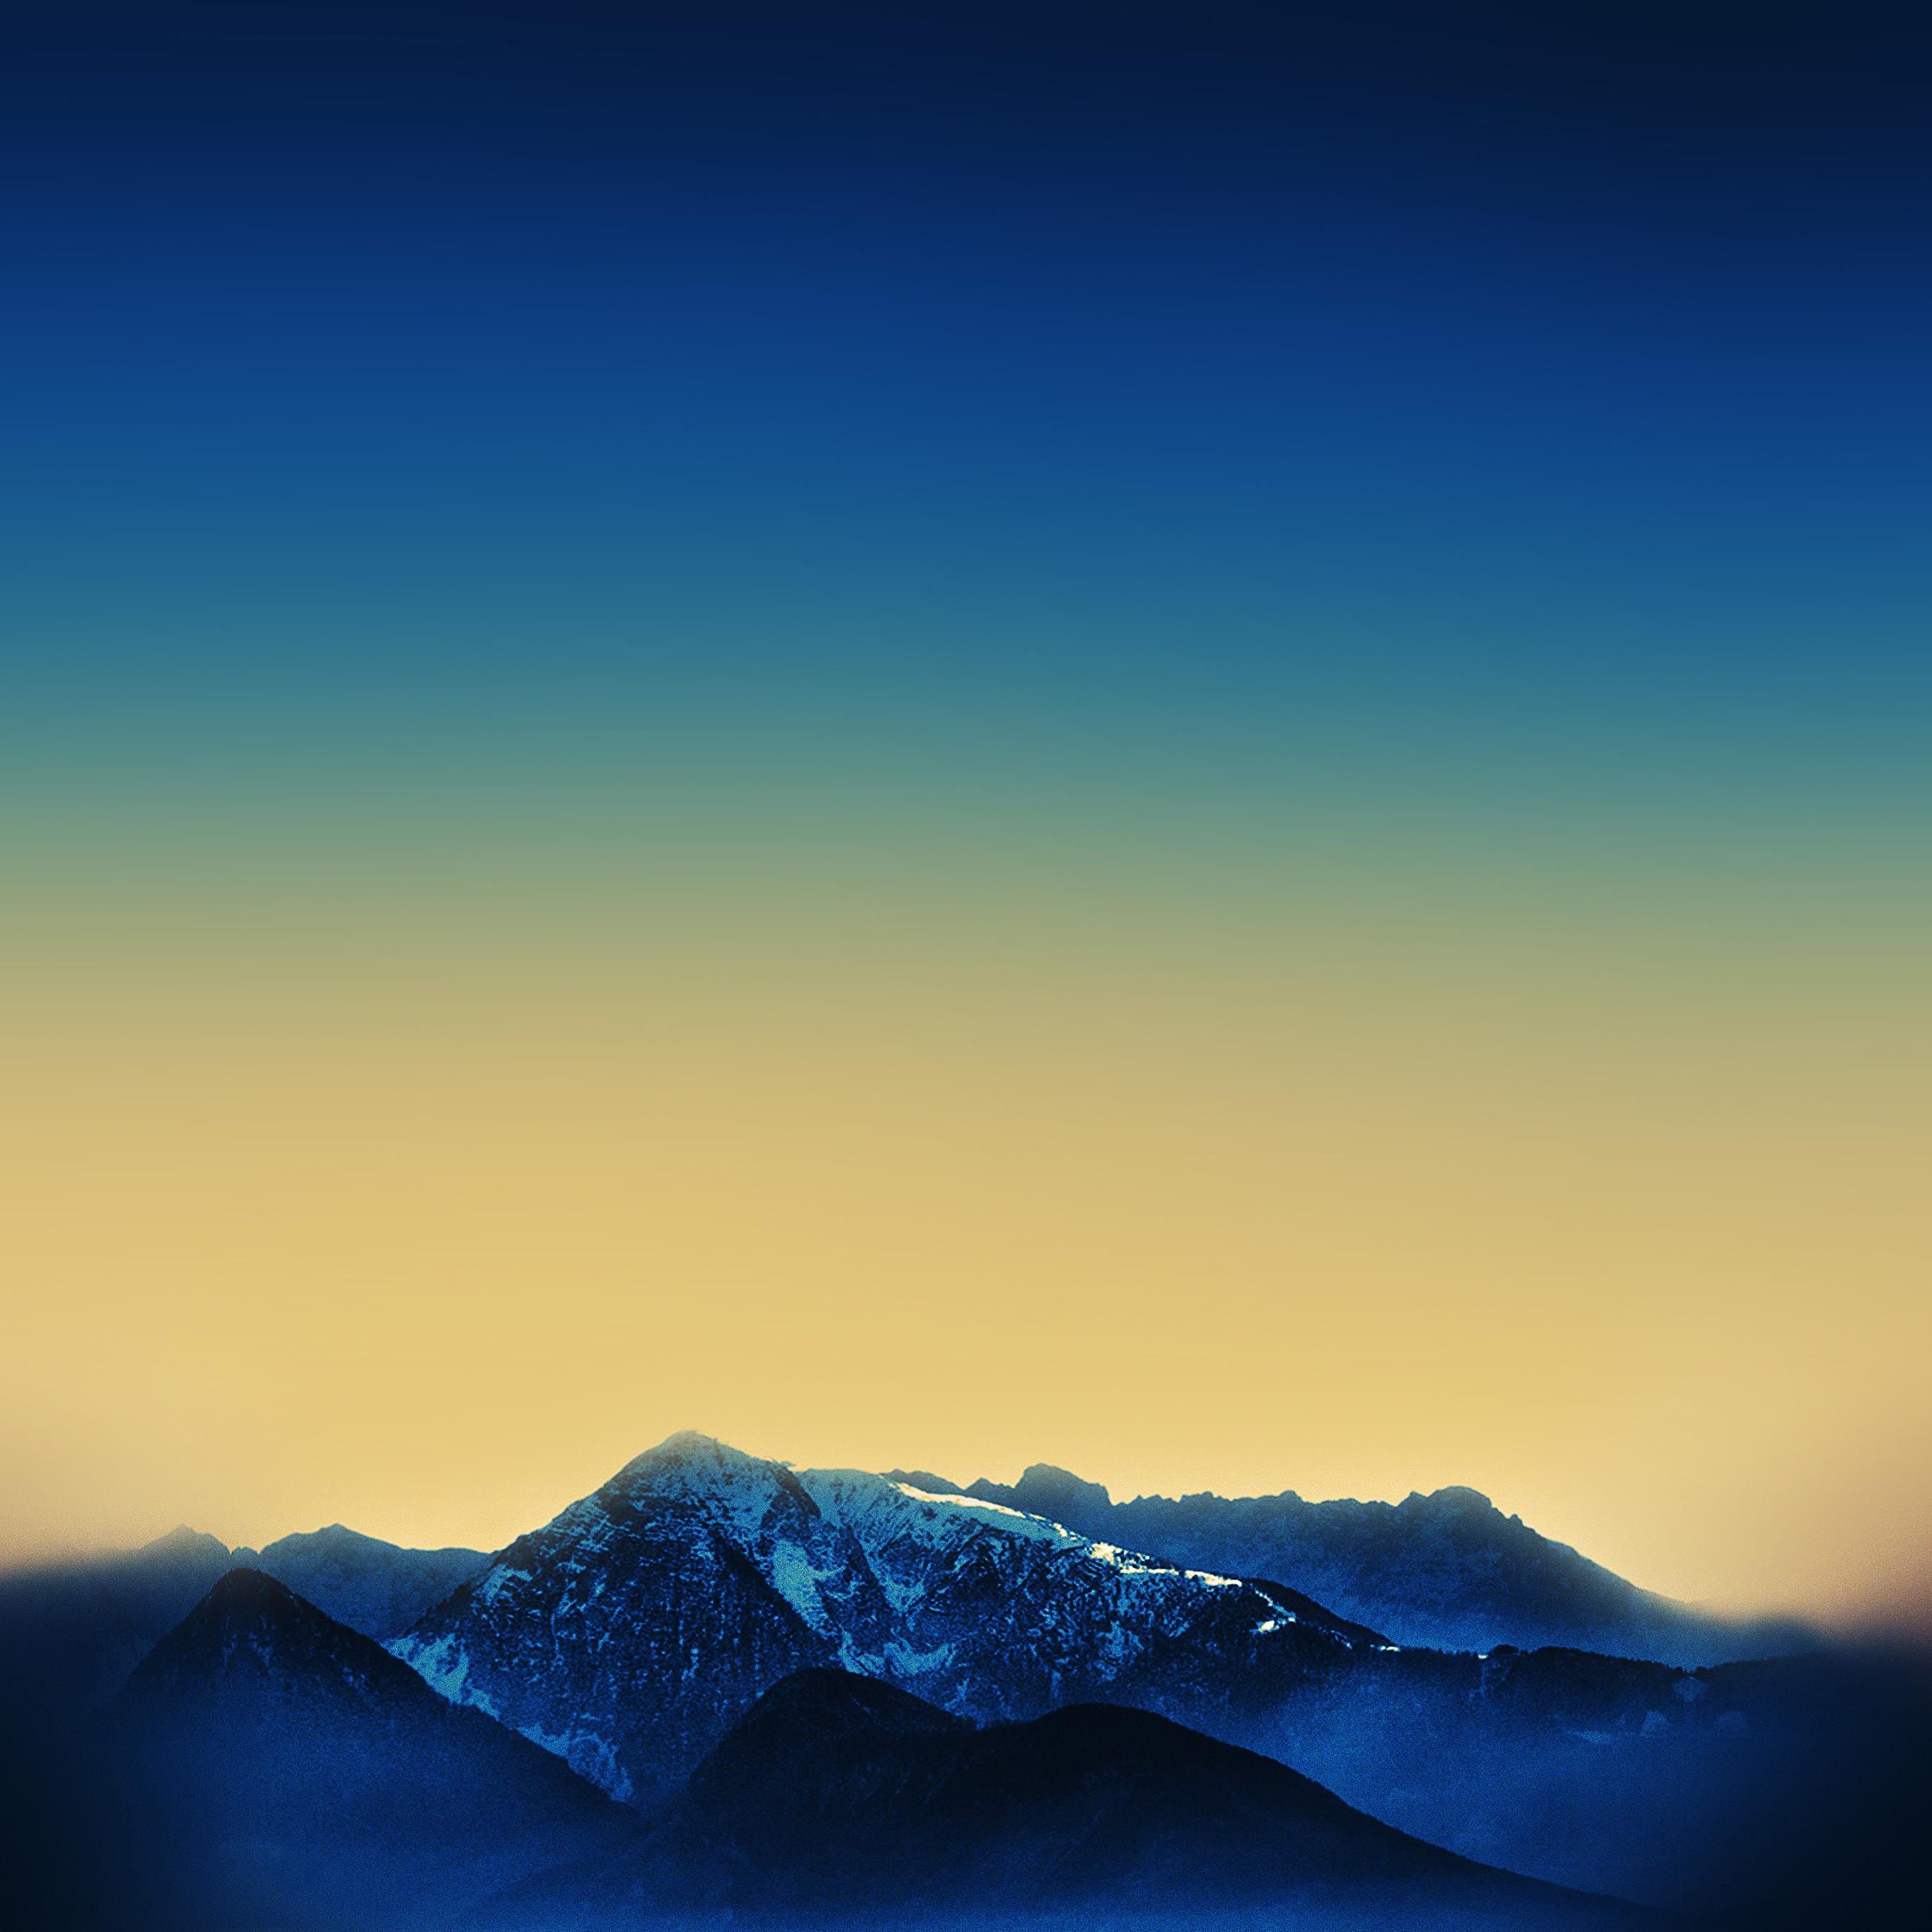 Amazing Wallpaper Mountain Ipad Mini - papers  Gallery_545395.jpg